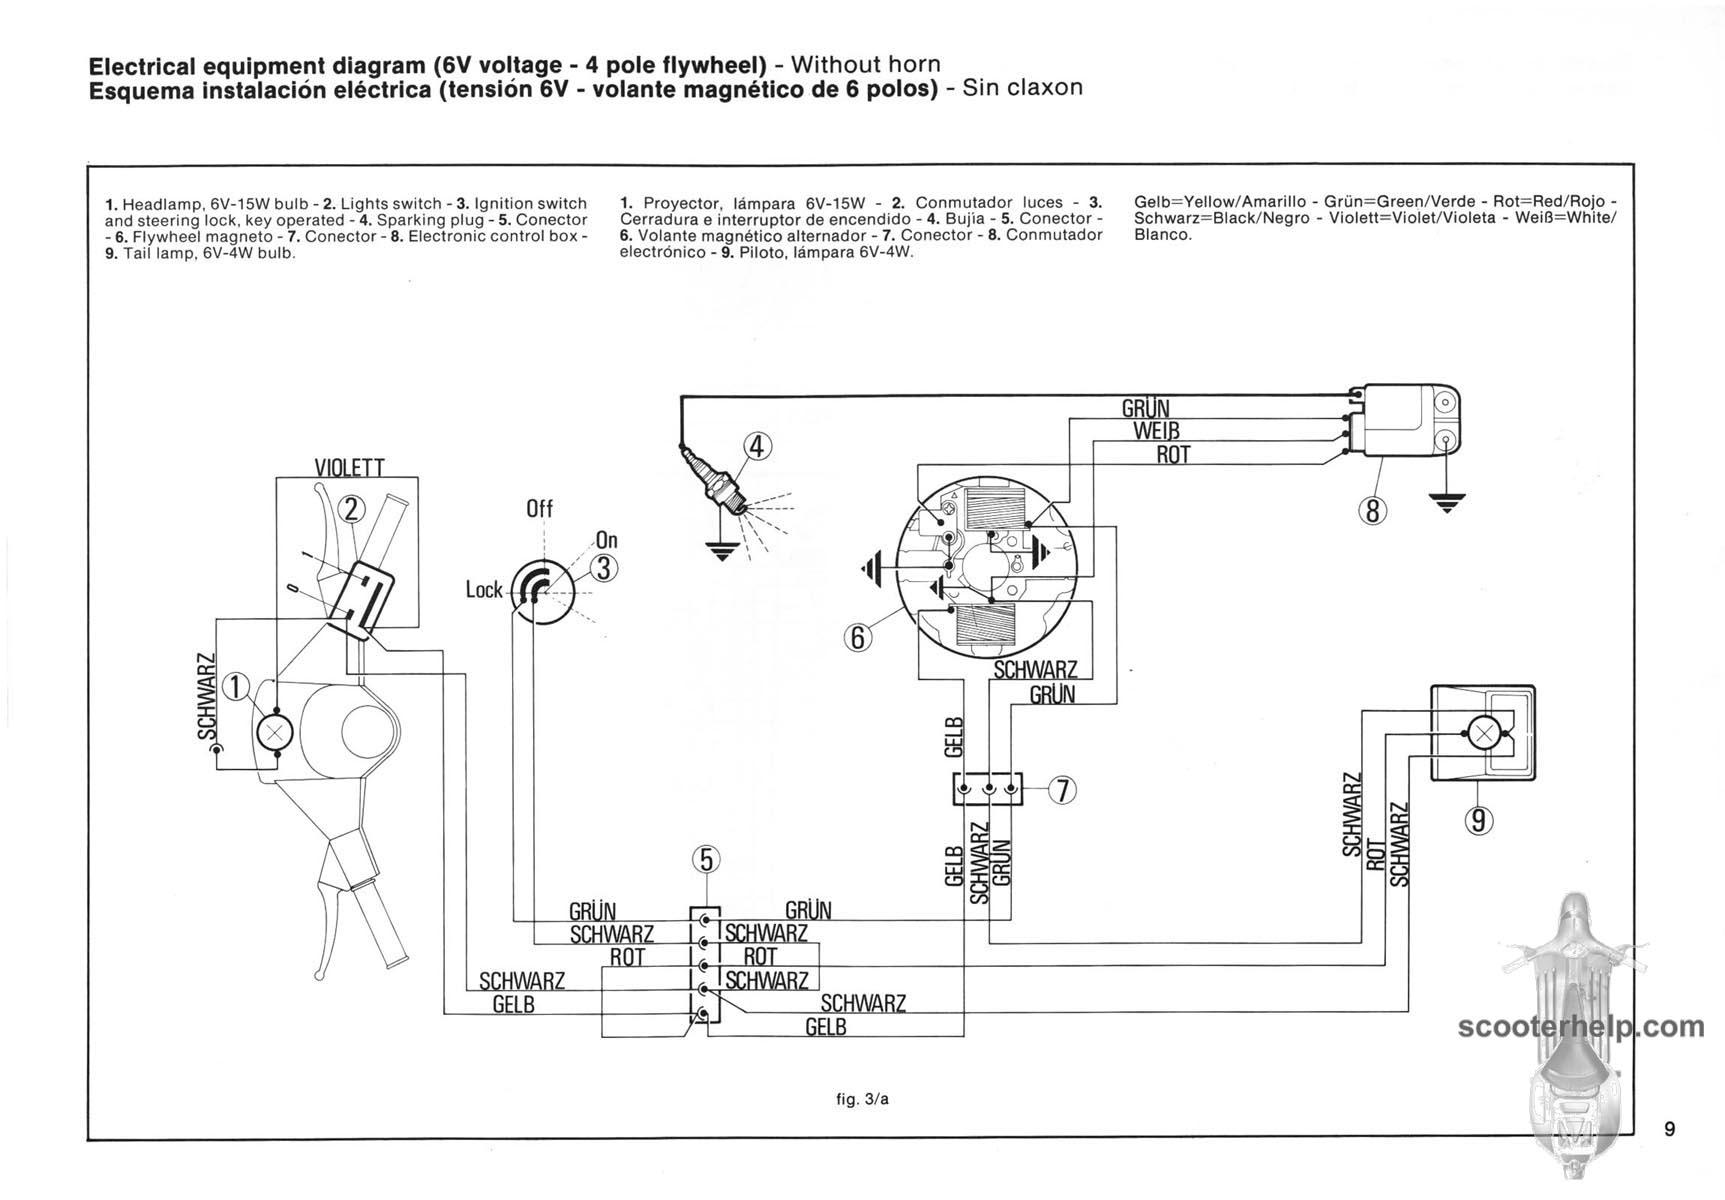 hight resolution of vespa pk50 pk50s pk50ss pk80s pl100s pk110s pk125 pk factory repair manual